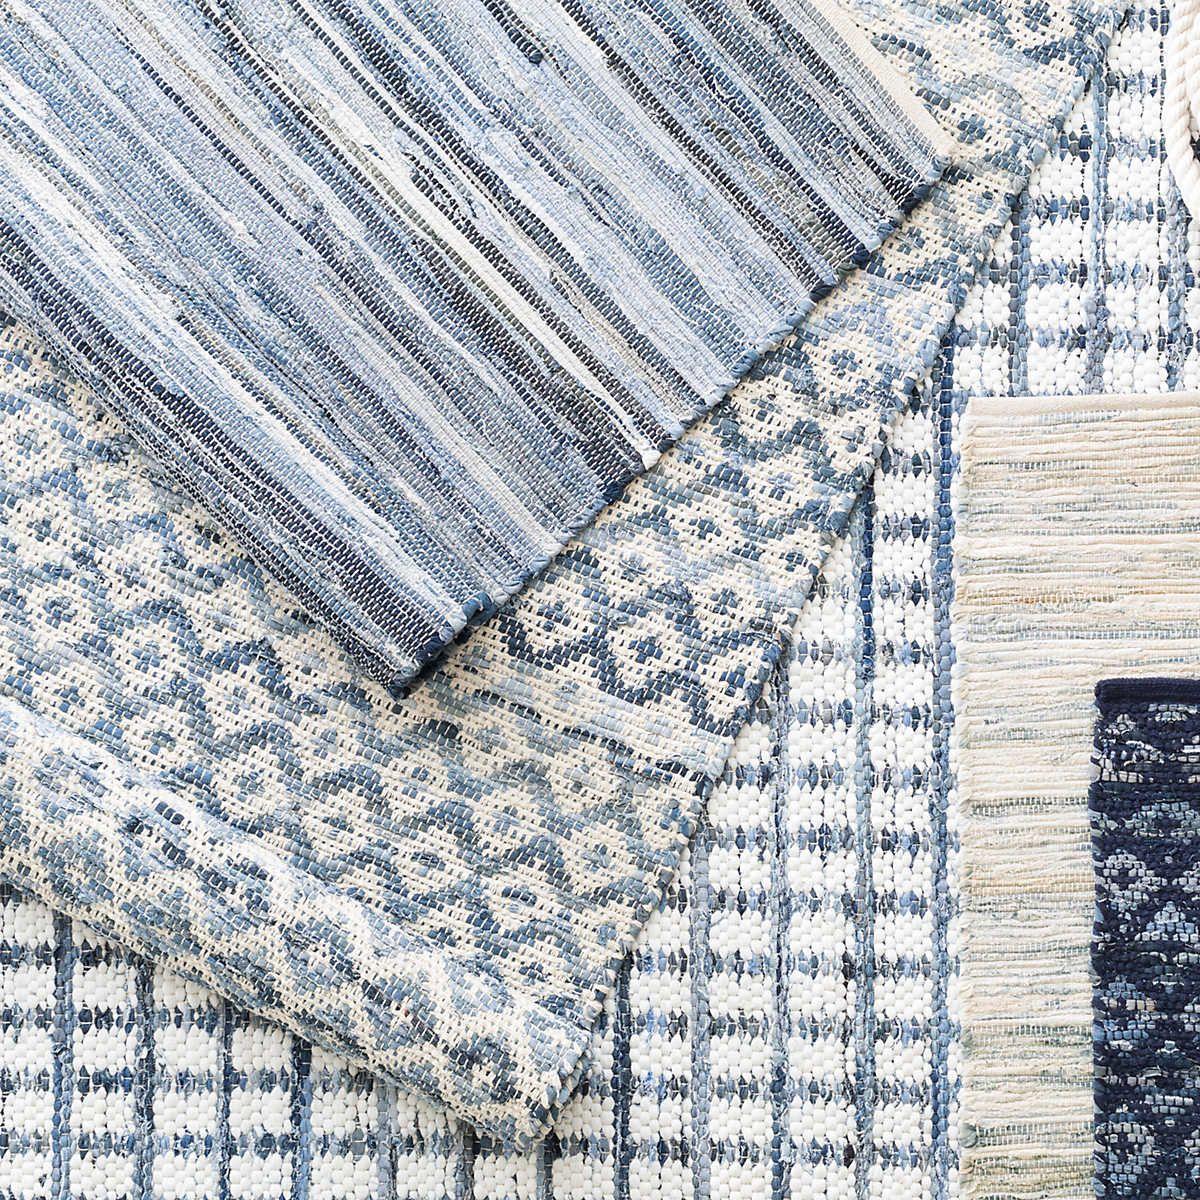 Denim Rag Squares Woven Cotton Rug Dash Albert In 2020 Cotton Rug Denim Rag Rugs Rugs On Carpet